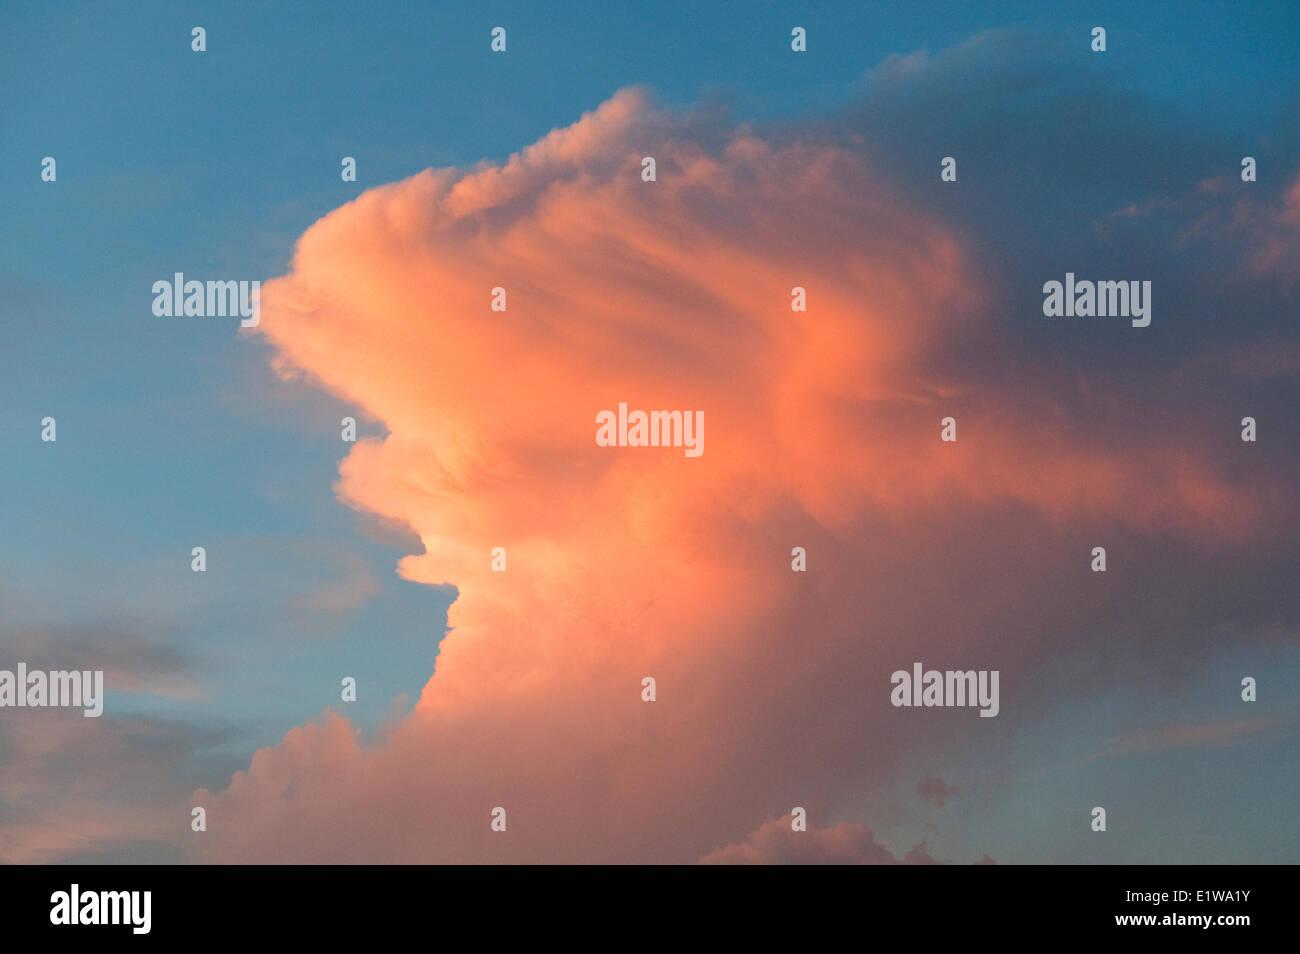 Cumulonimbus clouds, southwest Alberta, Canada. - Stock Image